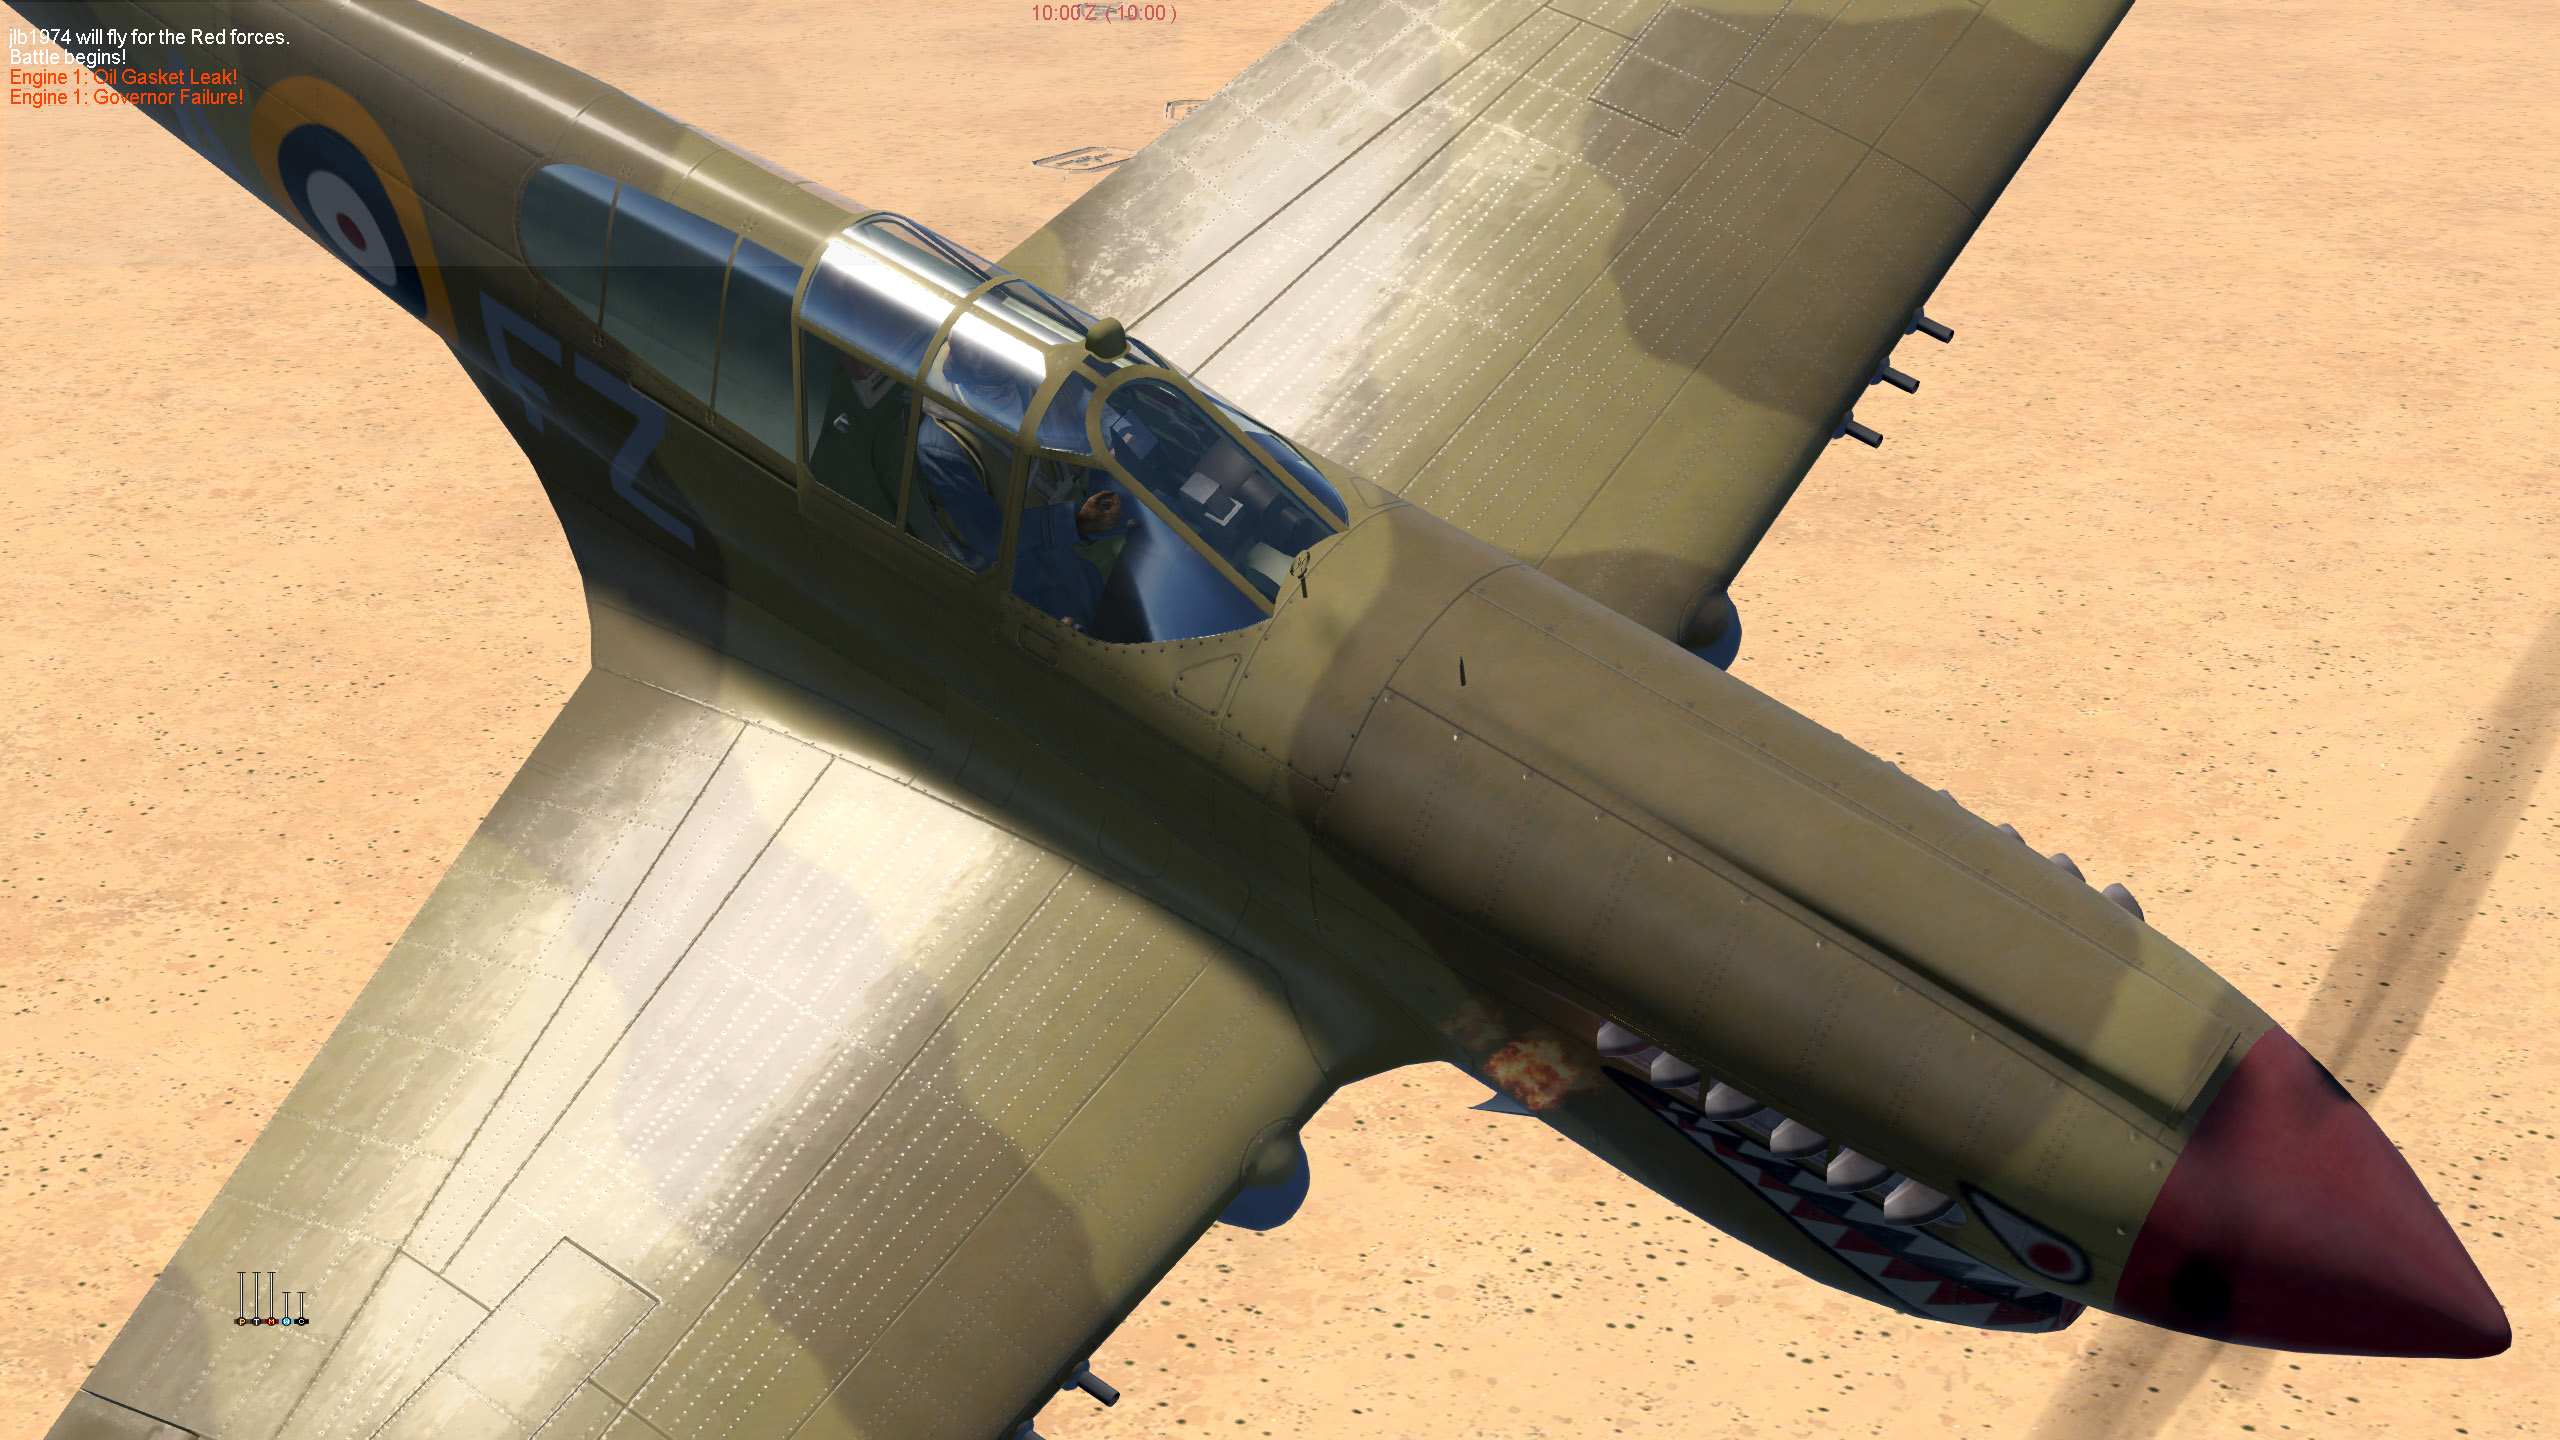 Kittyhawk-4k.jpg